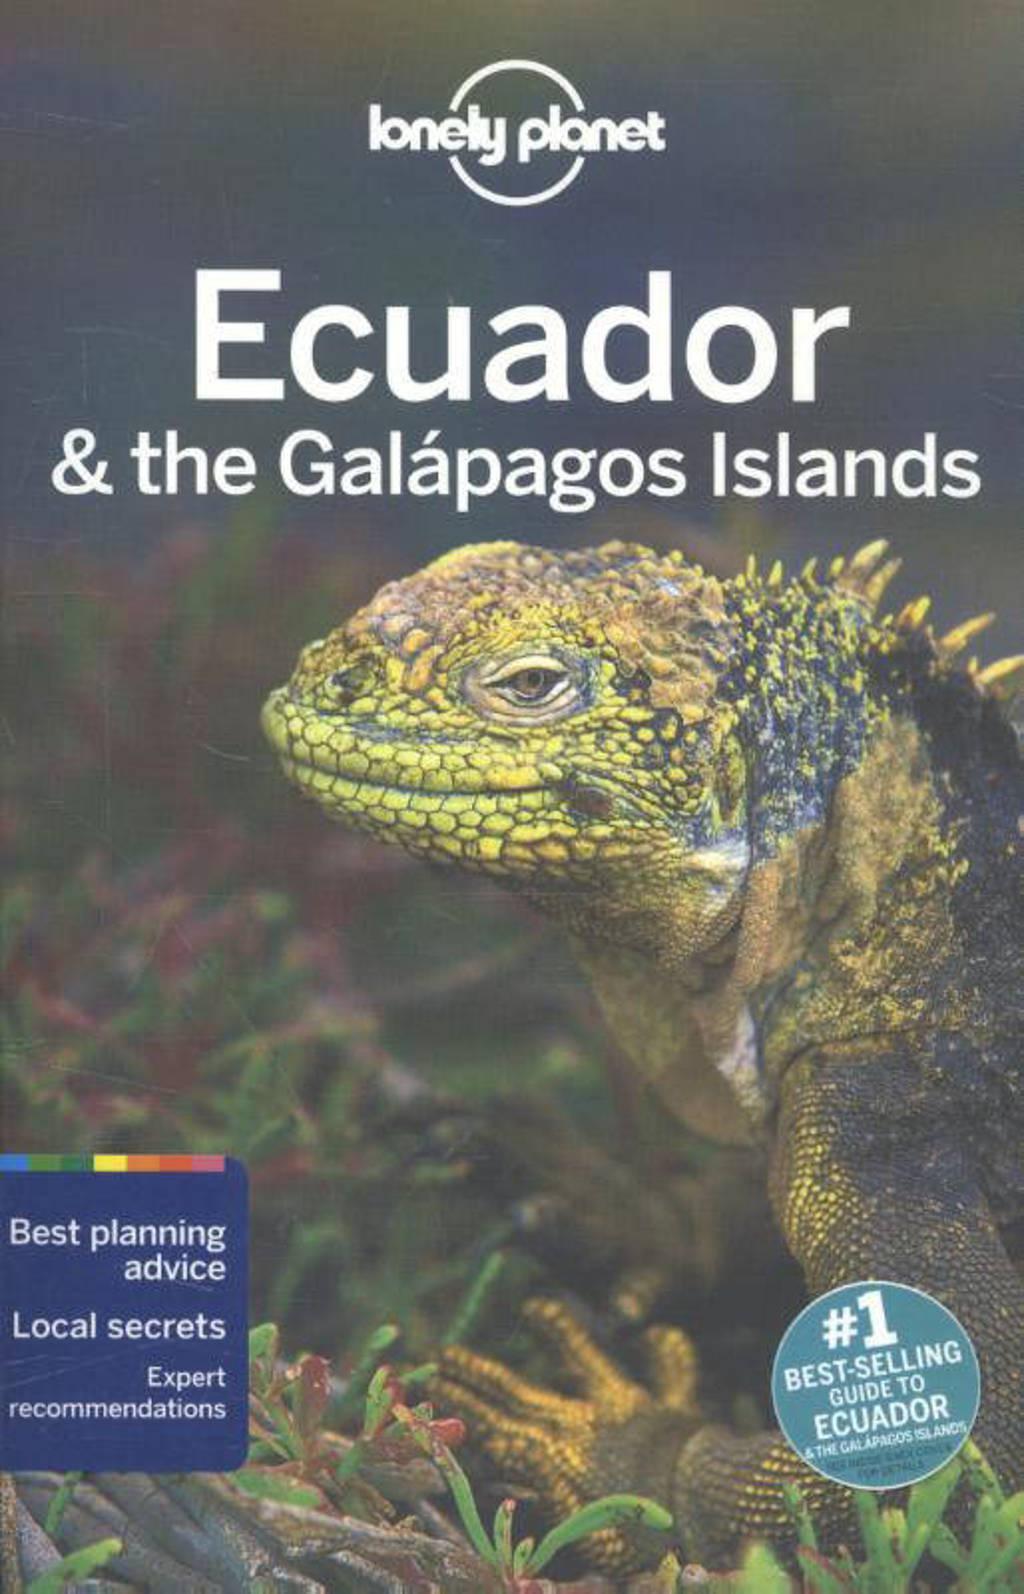 Lonely Planet Ecuador & the Galapagos Islands dr 10